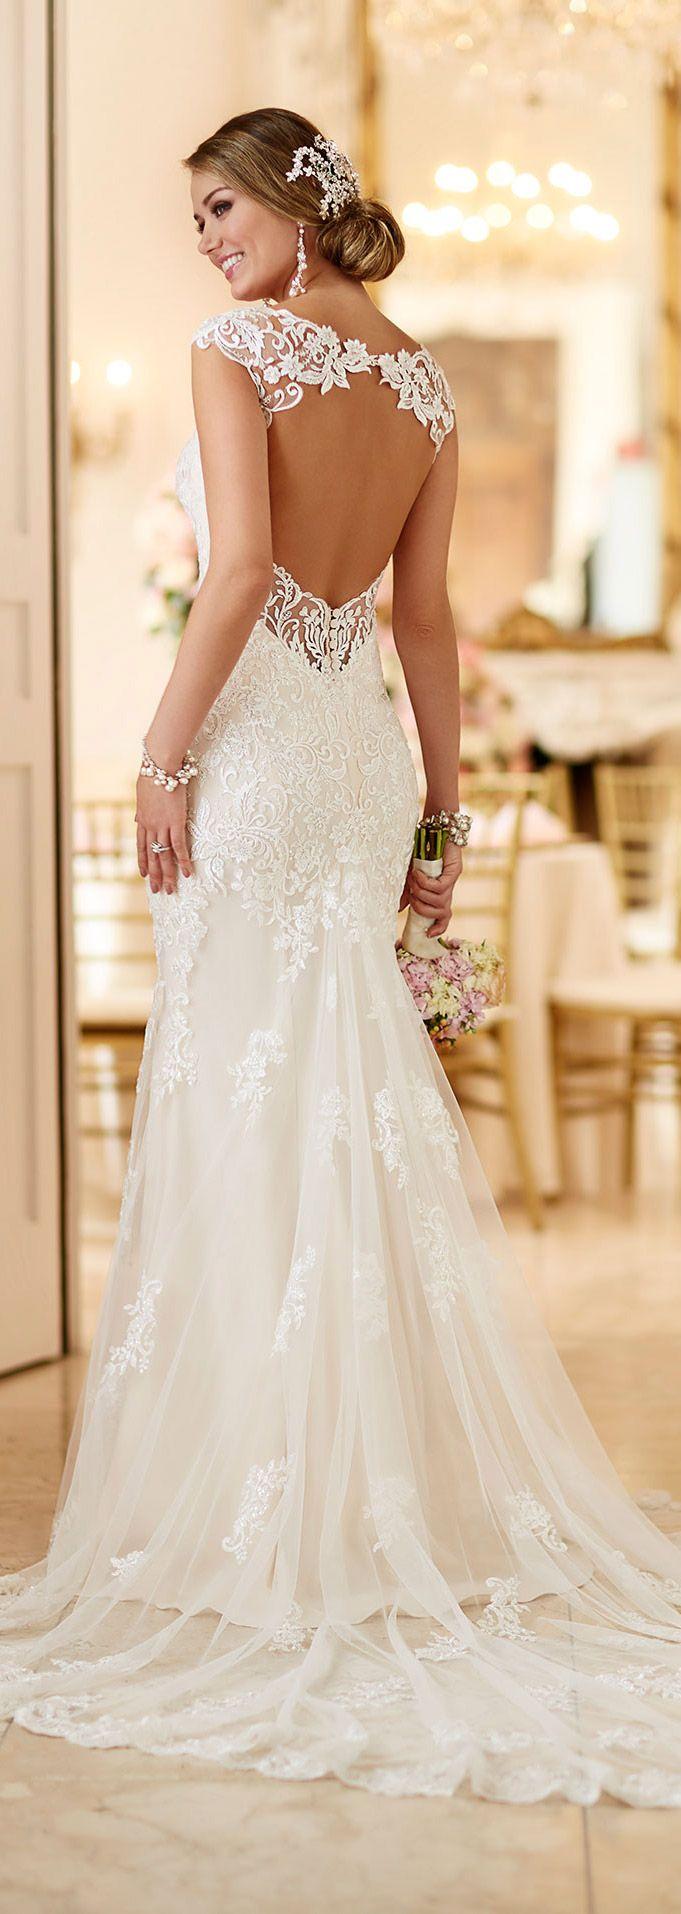 wedding dress romance lace flowy wedding dress Stella York open back lace wedding dresses